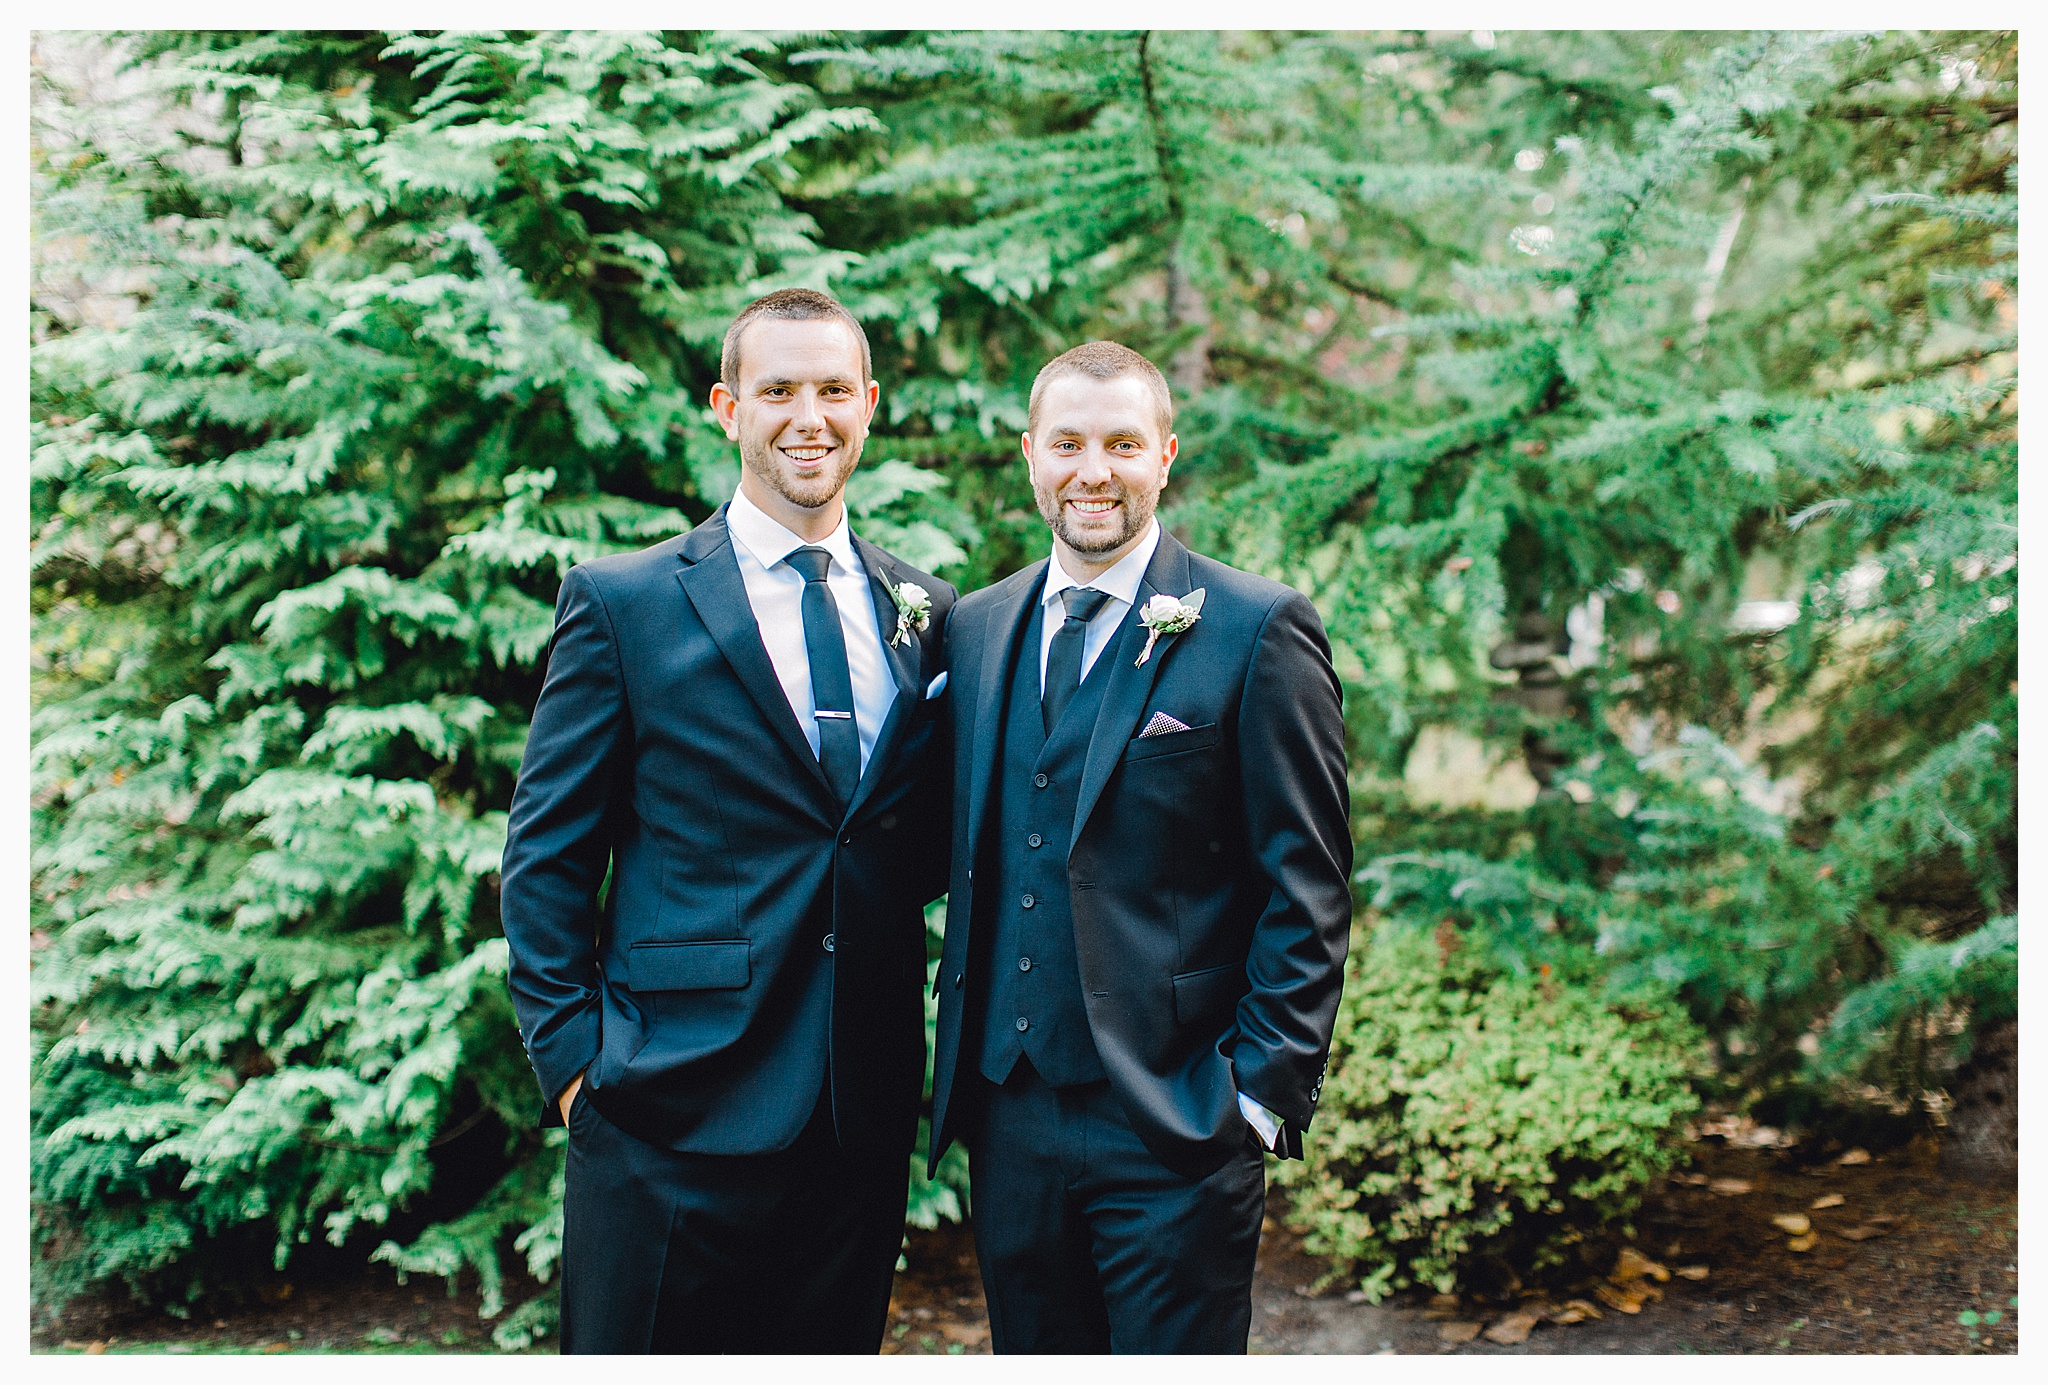 Emma Rose Company Light and Airy Wedding Photographer, Beautiful fall wedding at Rock Creek Gardens Venue in Puyallup, Washington._0043.jpg